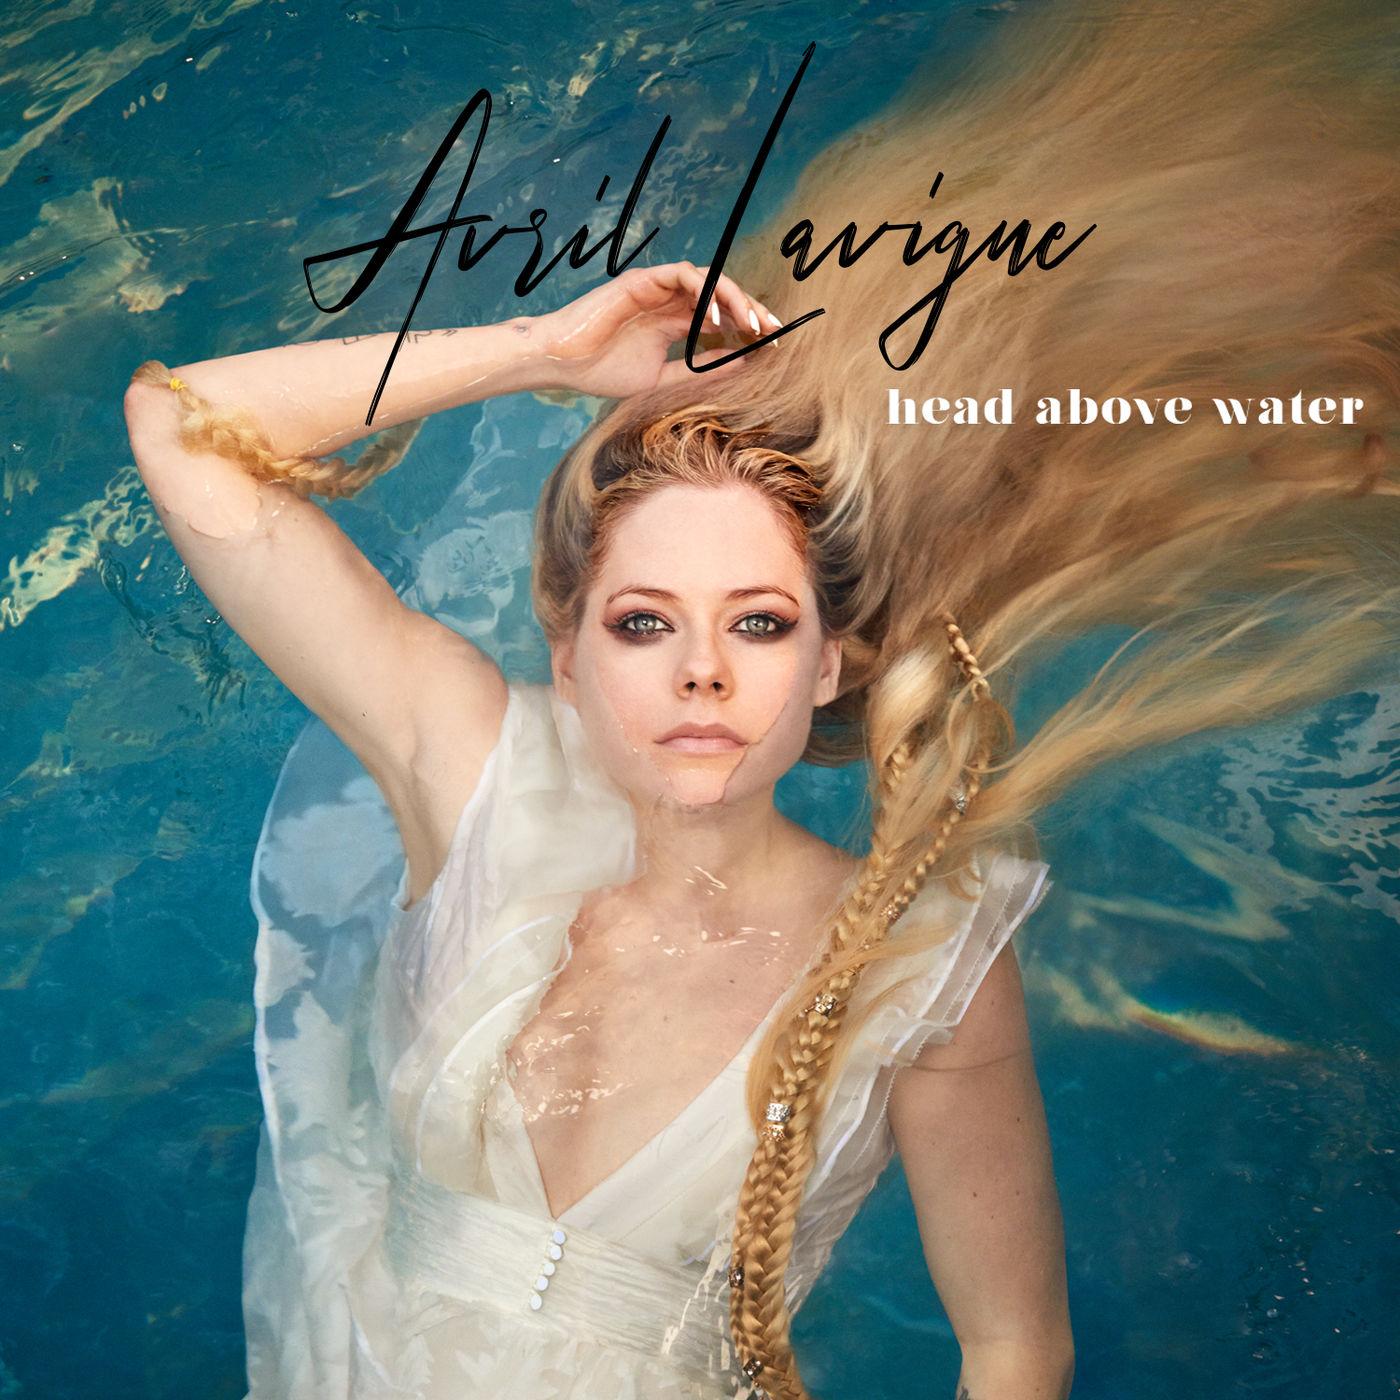 Avril+Lavigne+-+Head+Above+Water.jpg